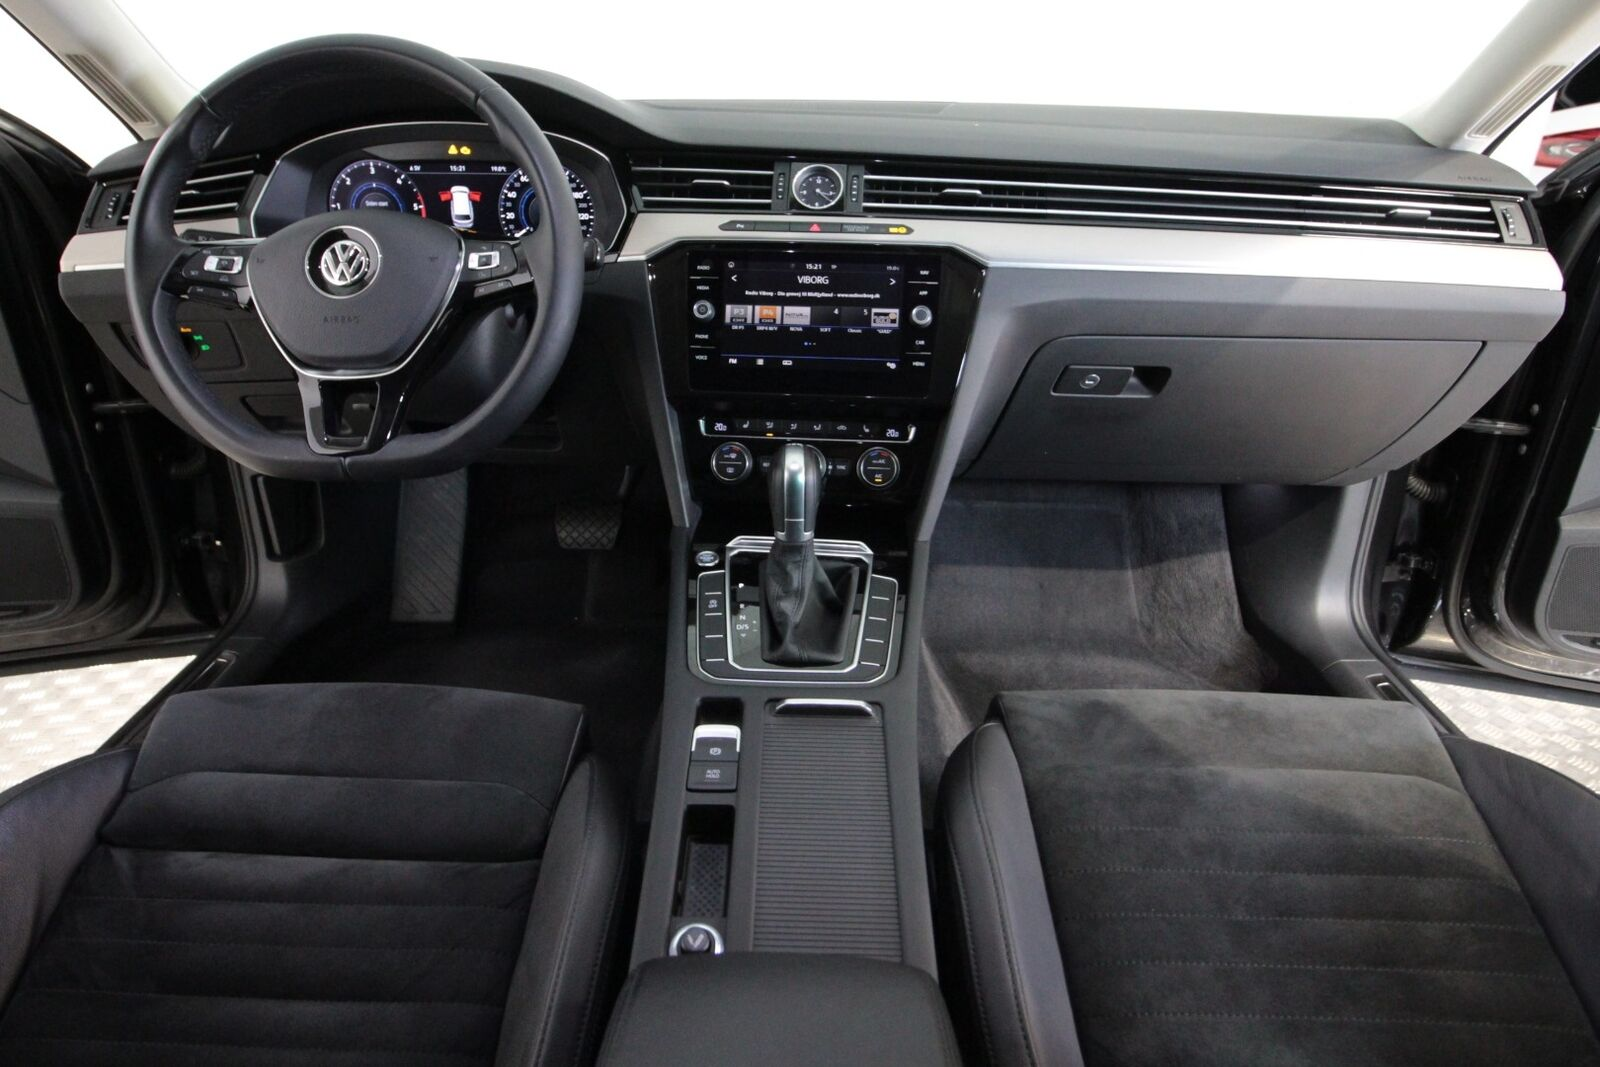 VW Passat TDi 190 Highl. Prem. Vari. DSG